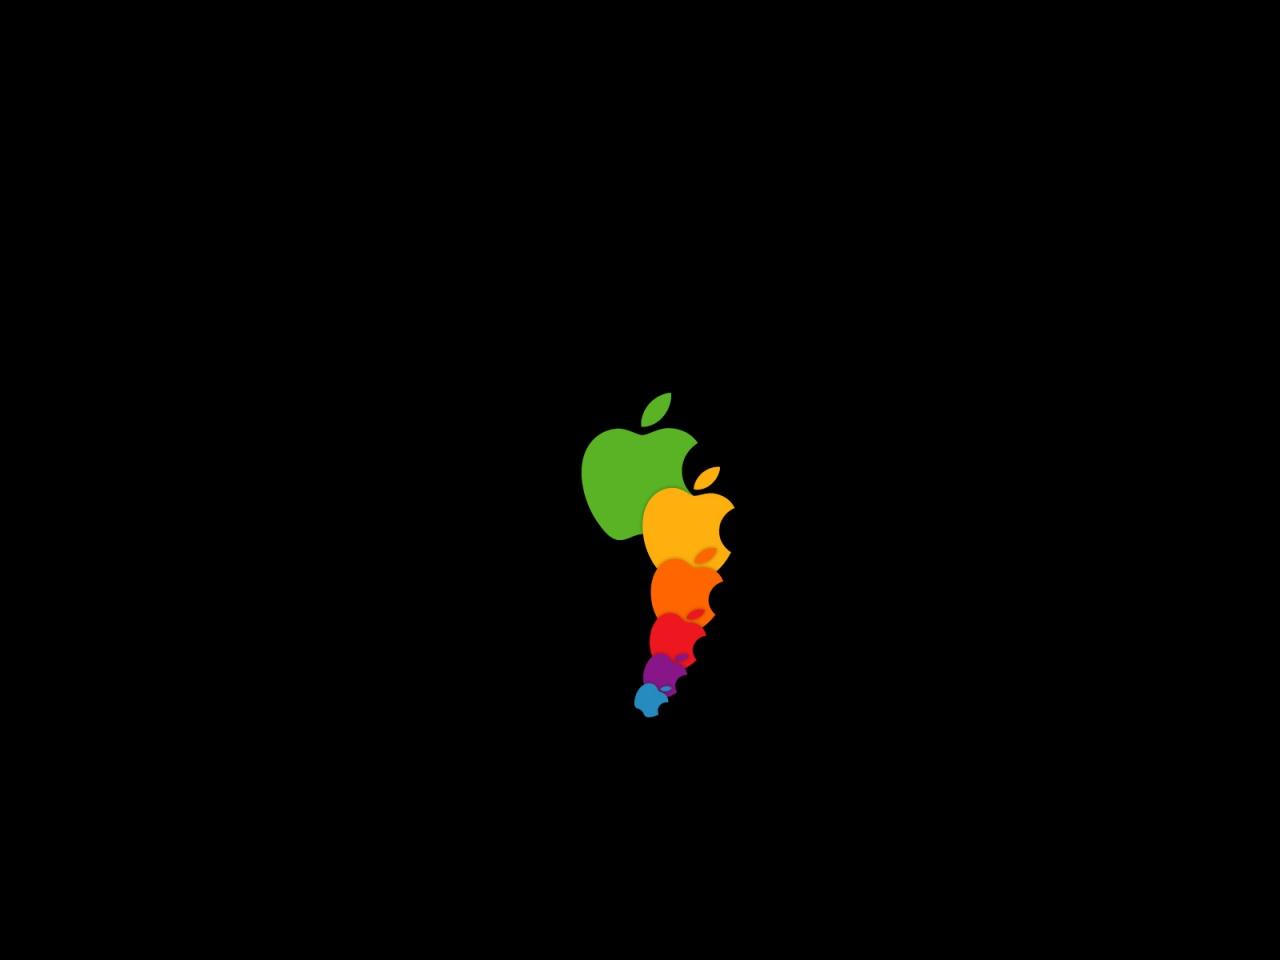 mac wallpapers desktop wallpaper - photo #49